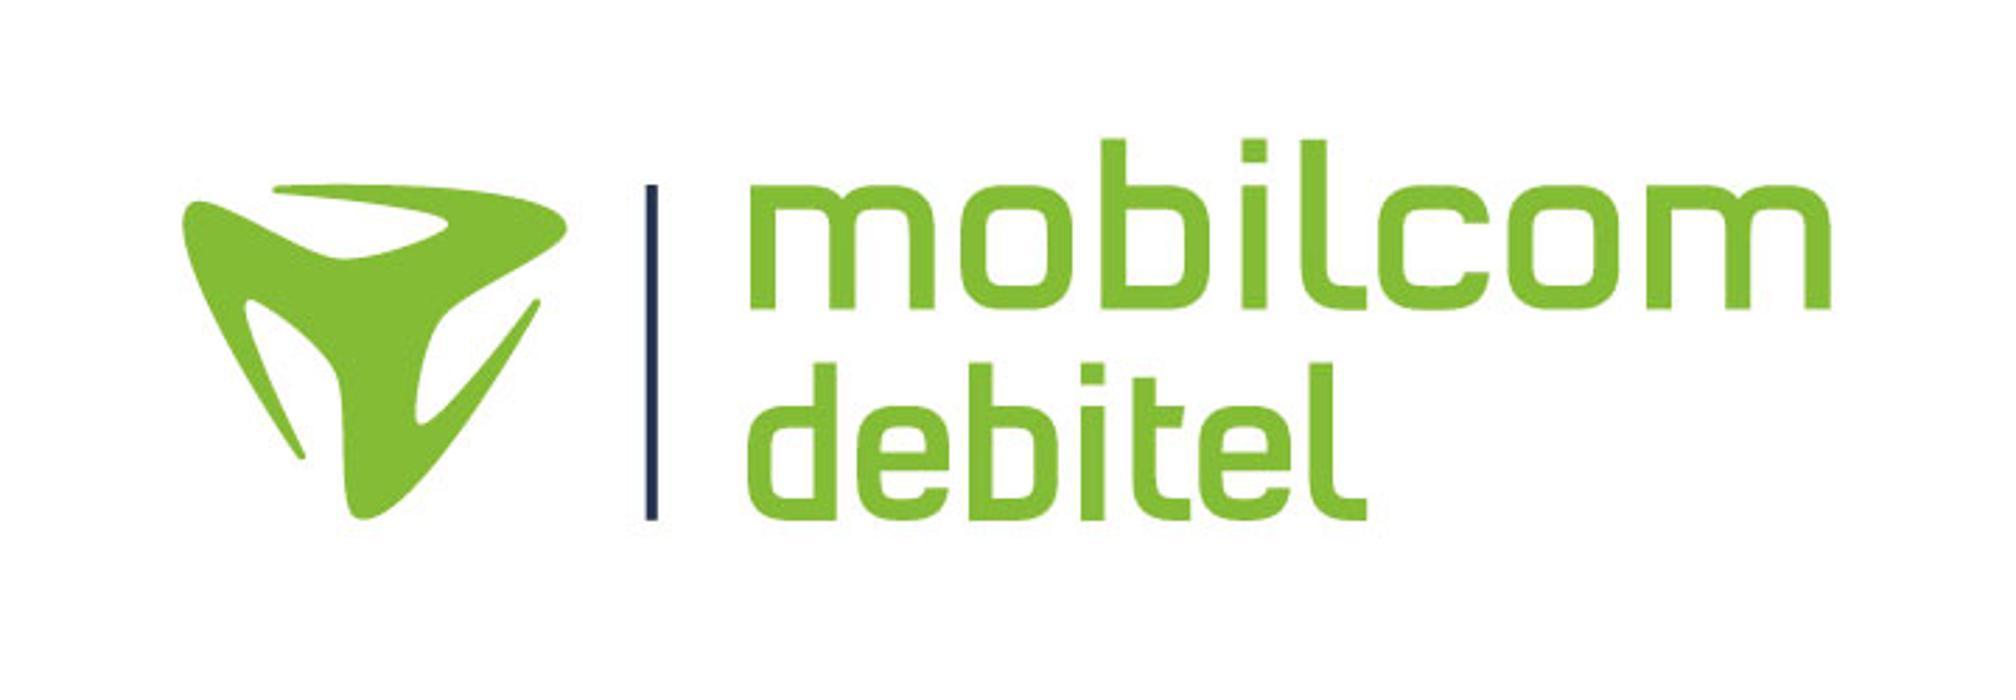 mobilcom-debitel, Luegallee in Düsseldorf